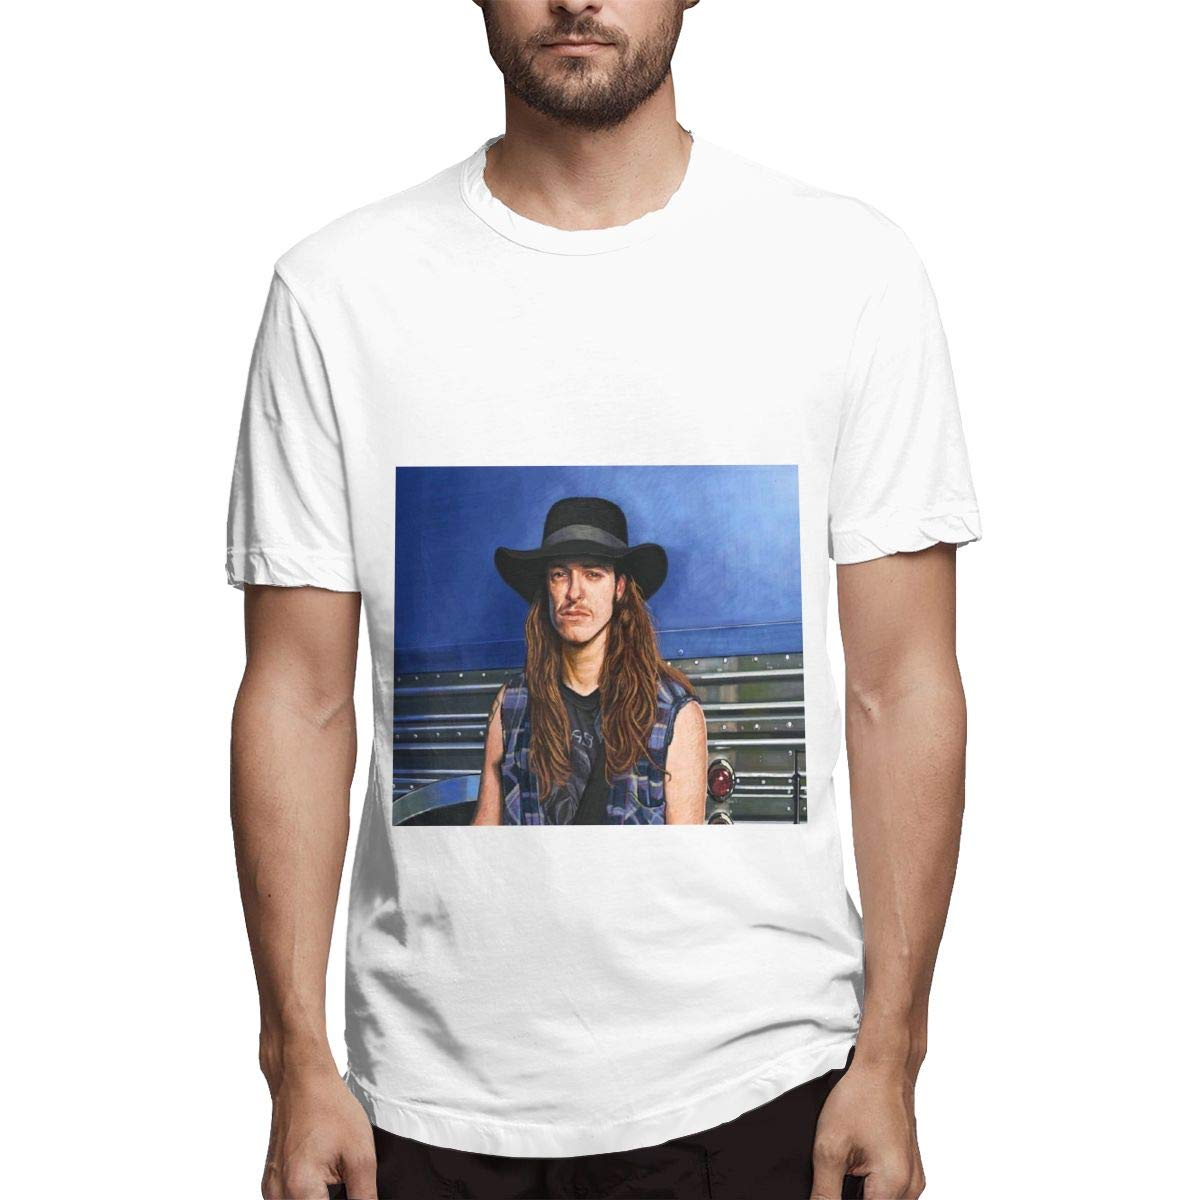 Lihehen S Cliff Lee Burton Simple Casual Round Neck Shirts